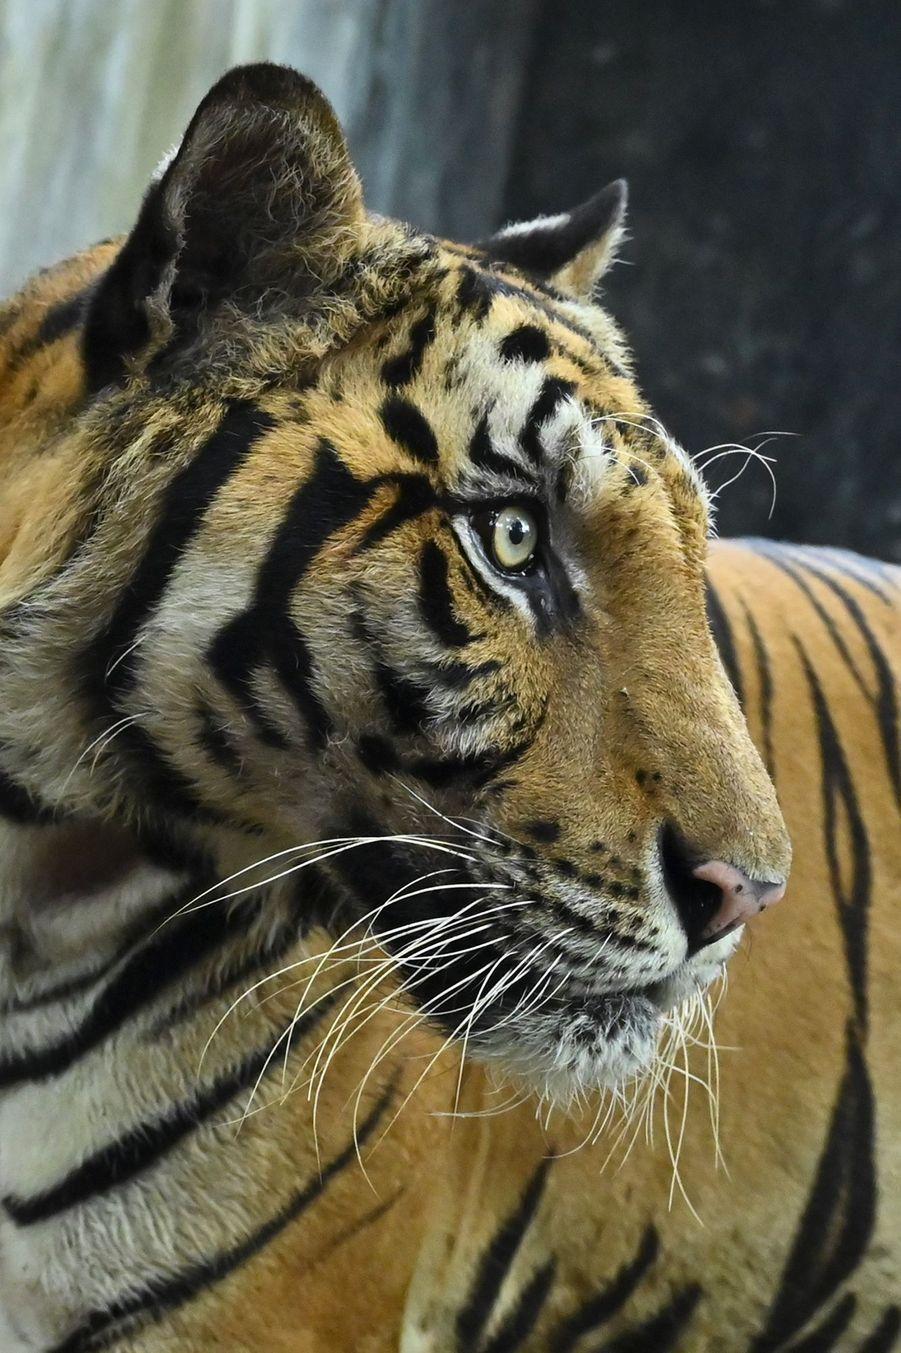 Un tigre au templeWat Pha Luang Ta Bua de Kanchanaburi.